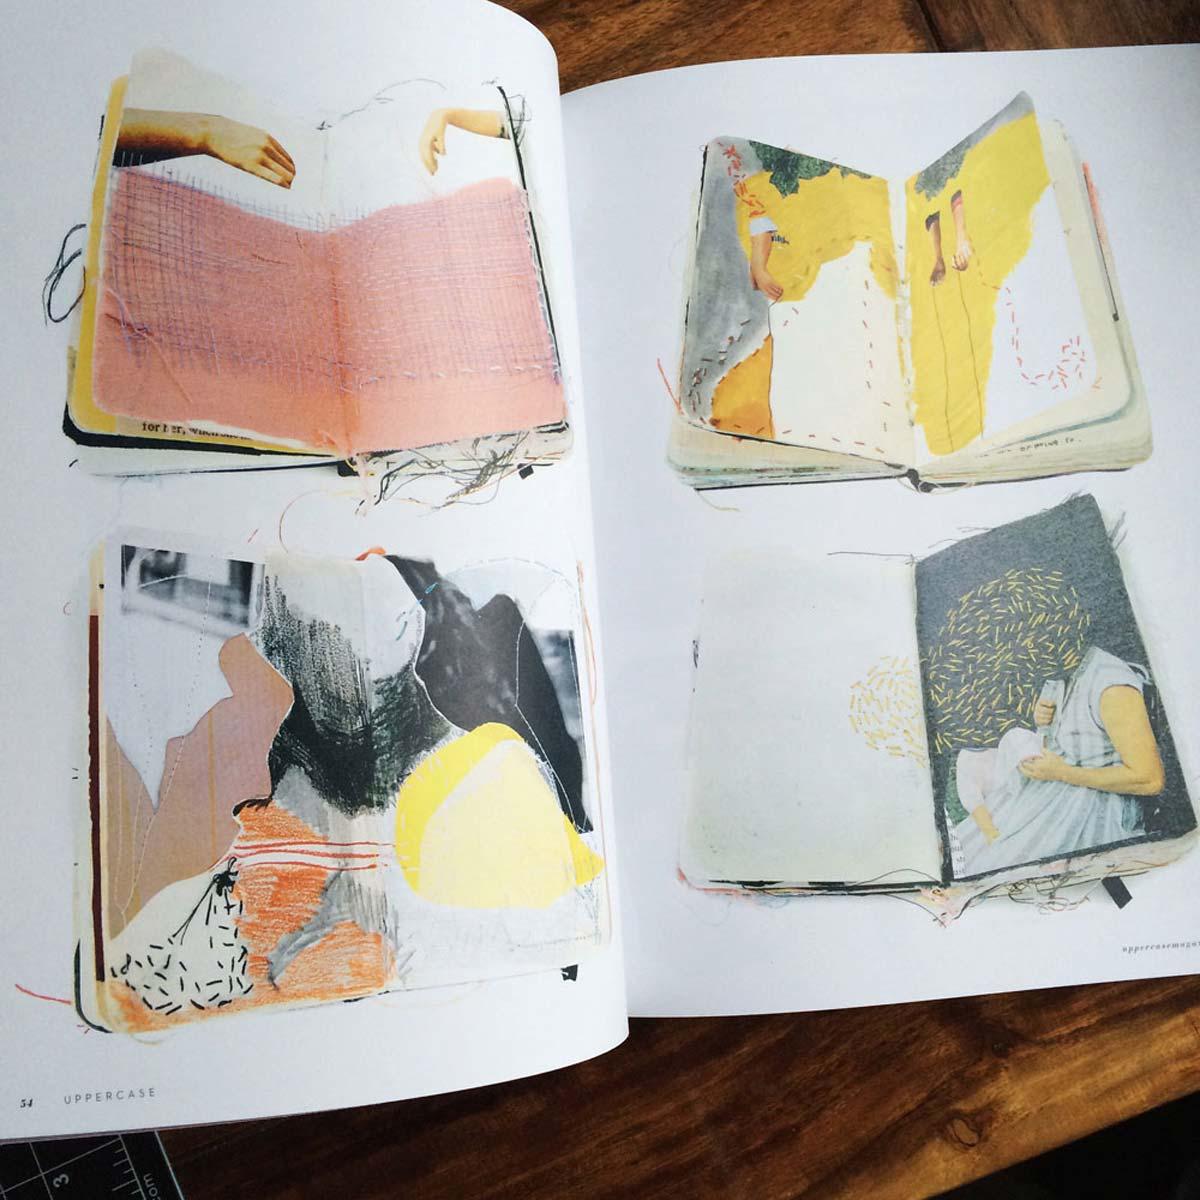 Alison Worman in Uppercase Magazine